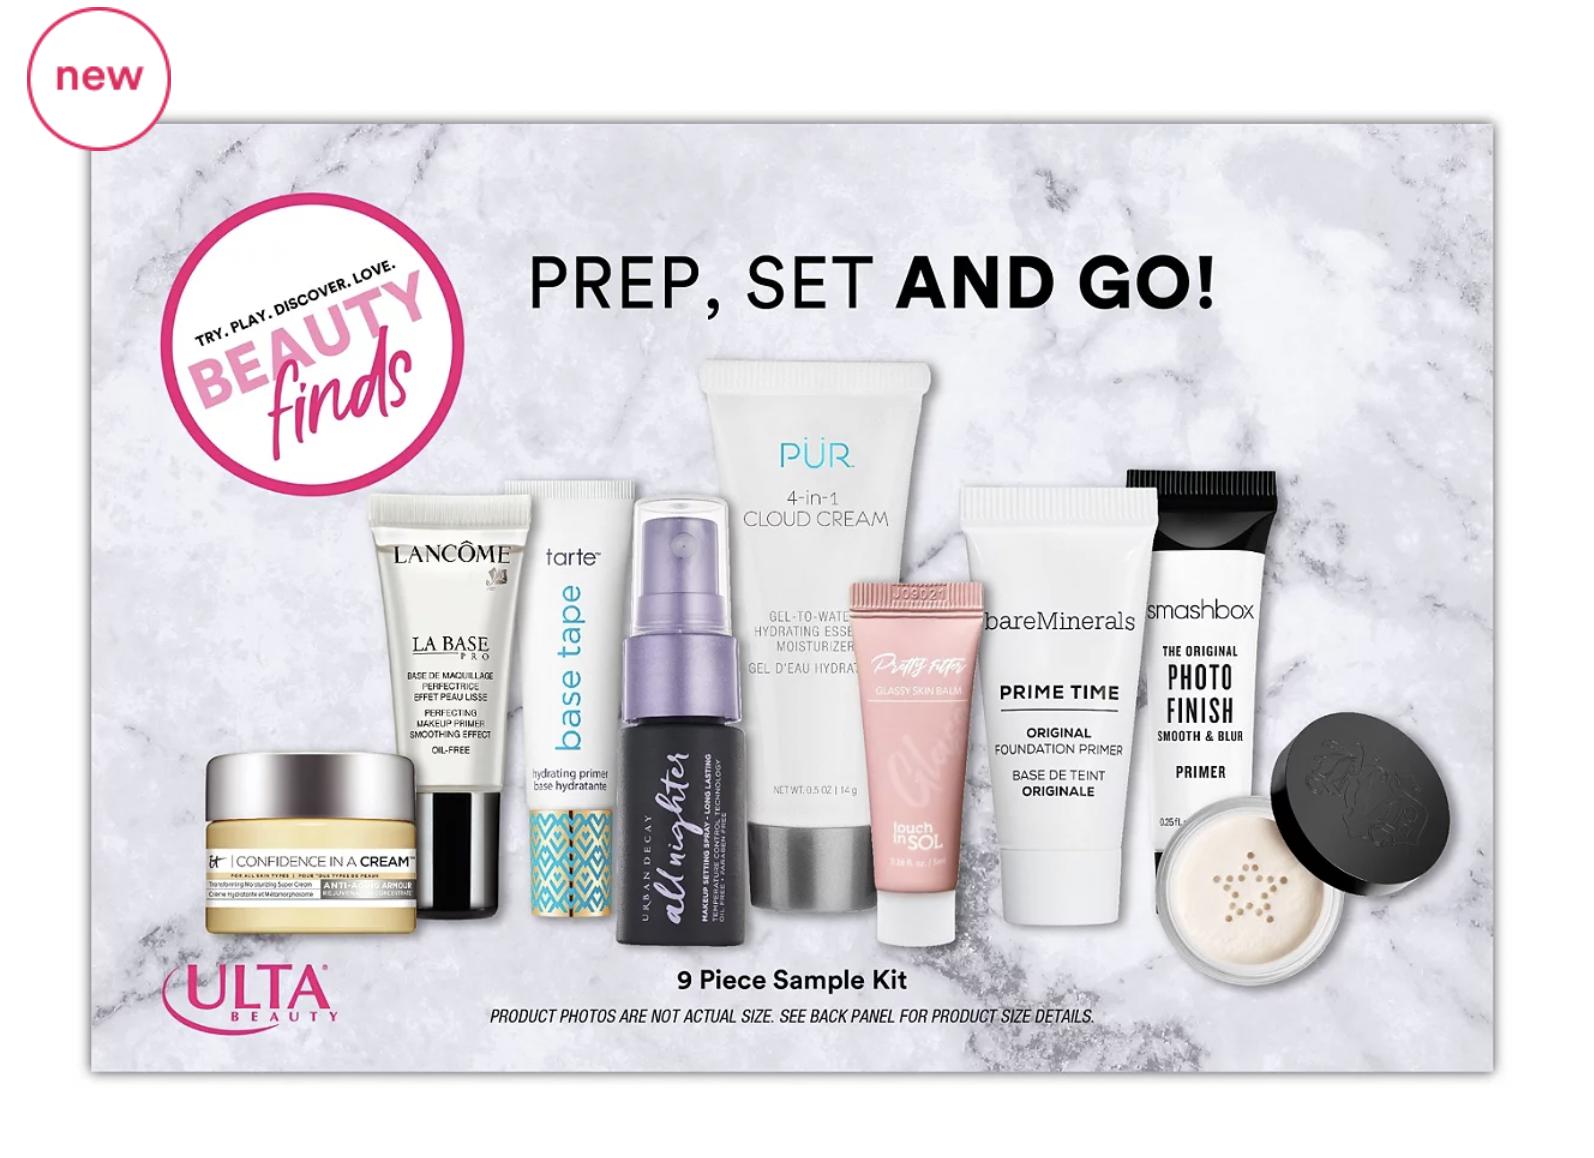 Beauty Finds by ULTA Beauty Prep, Set & Go Sample Kit – Available Now